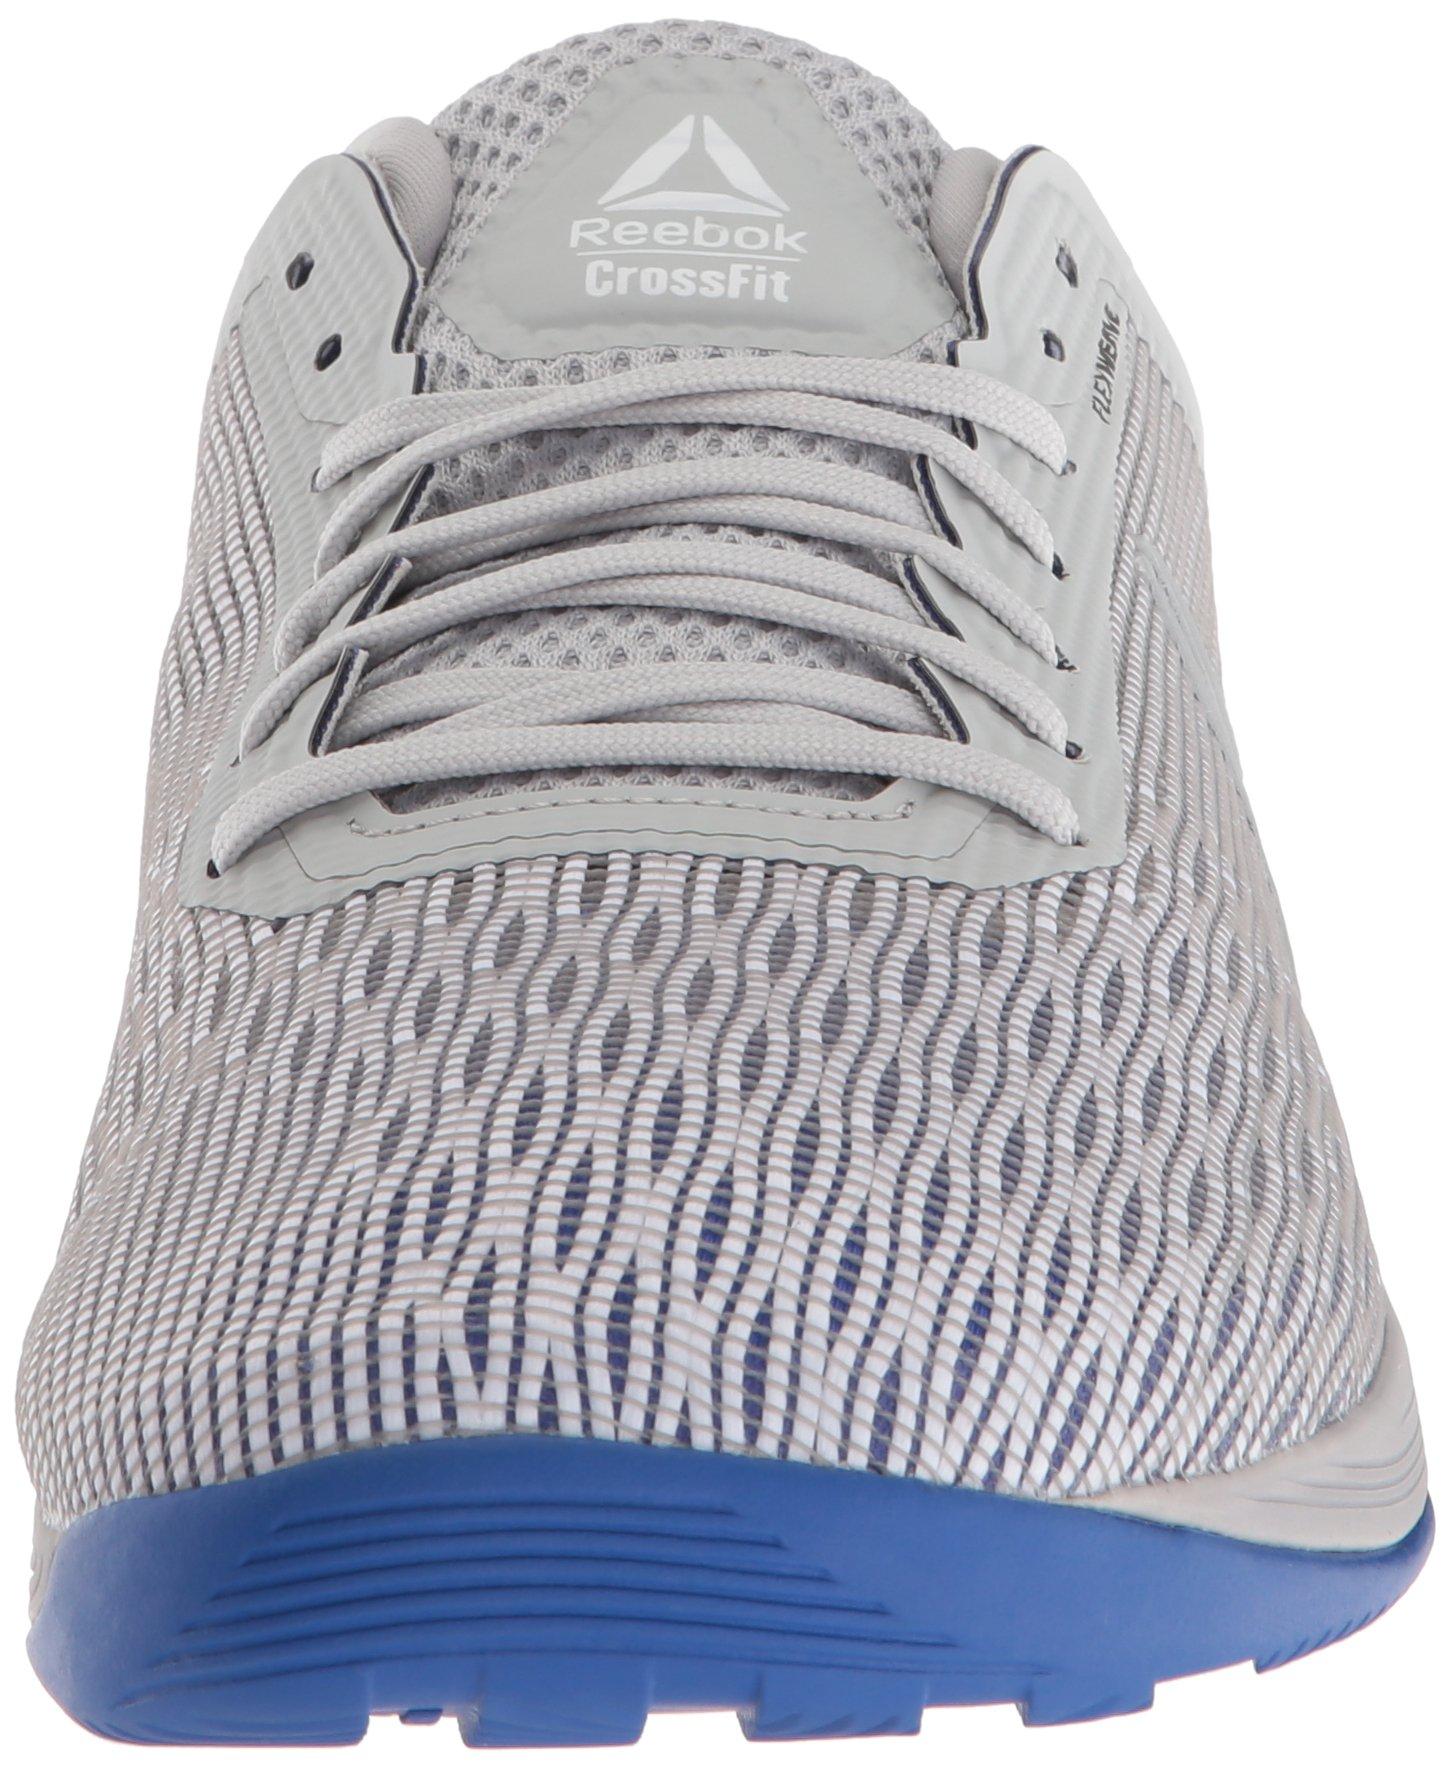 Reebok Men's CROSSFIT Nano 8.0 Sneaker, White/Stark Grey/Skull GR, 6.5 M US by Reebok (Image #4)